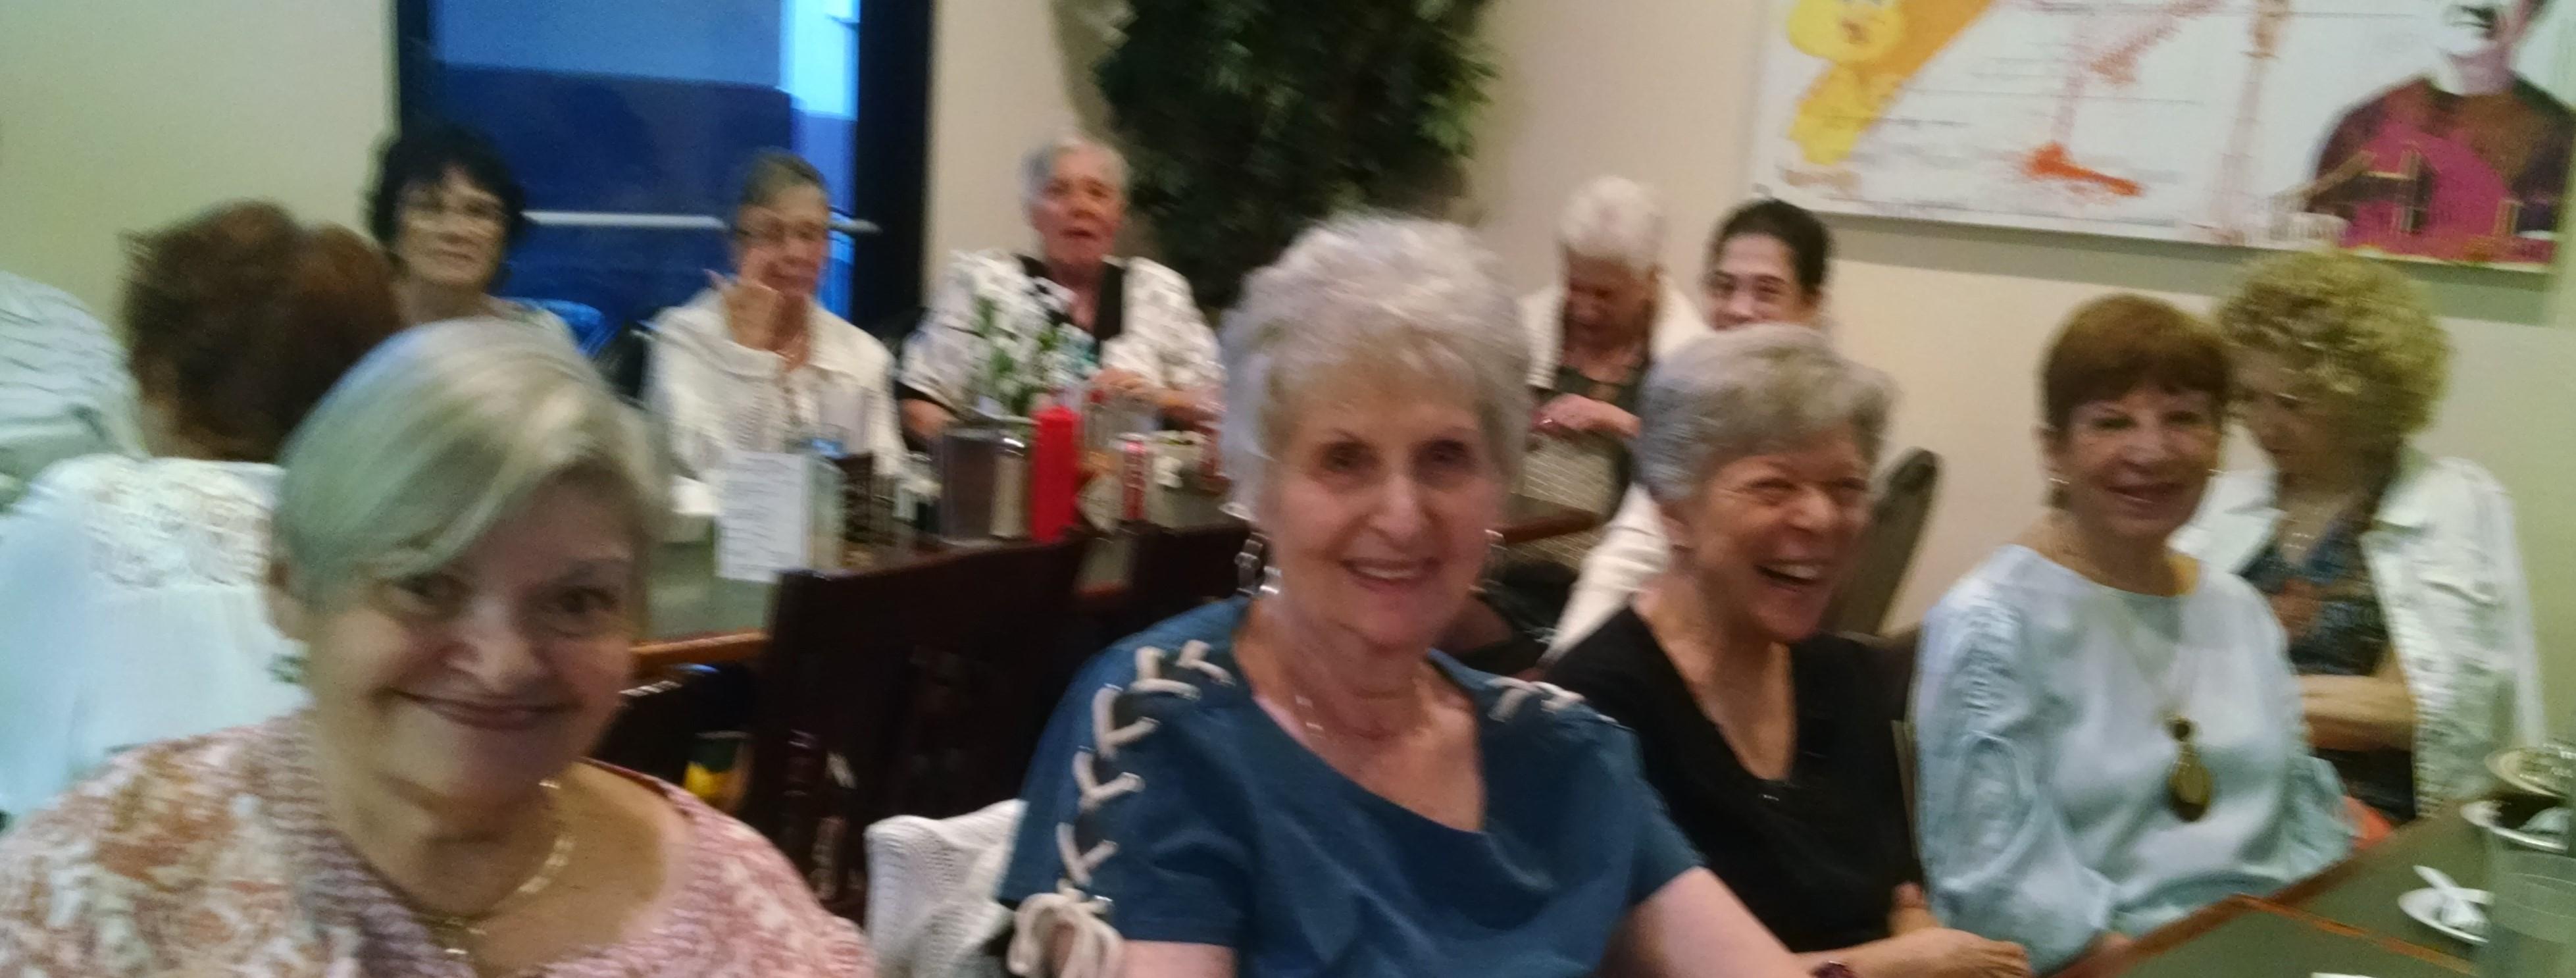 Jewish Women's Organization in Las Vegas